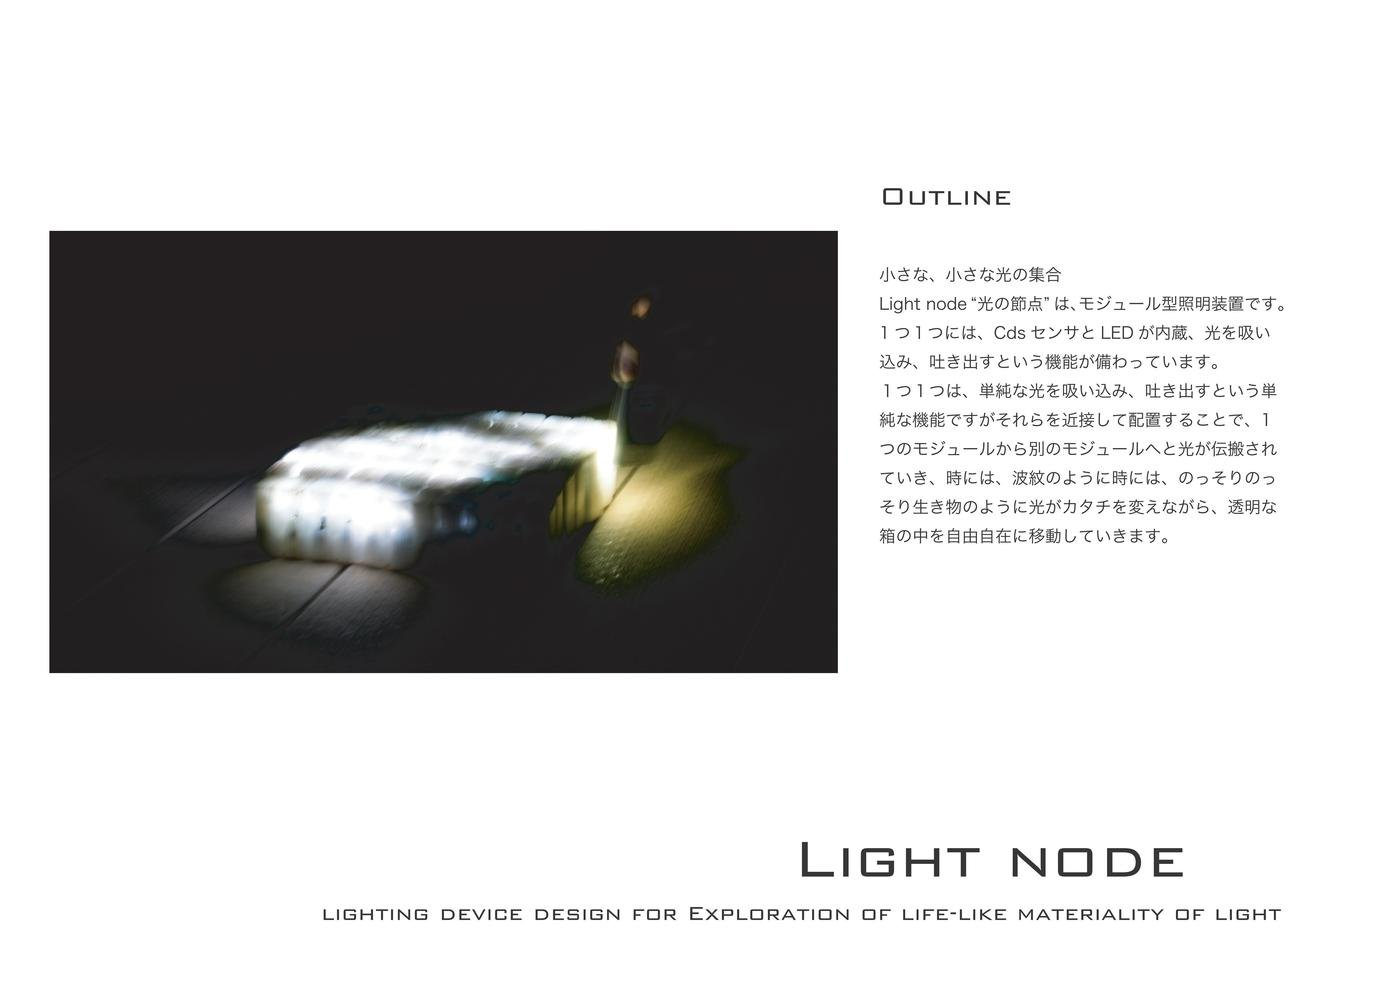 Light node イメージ 3